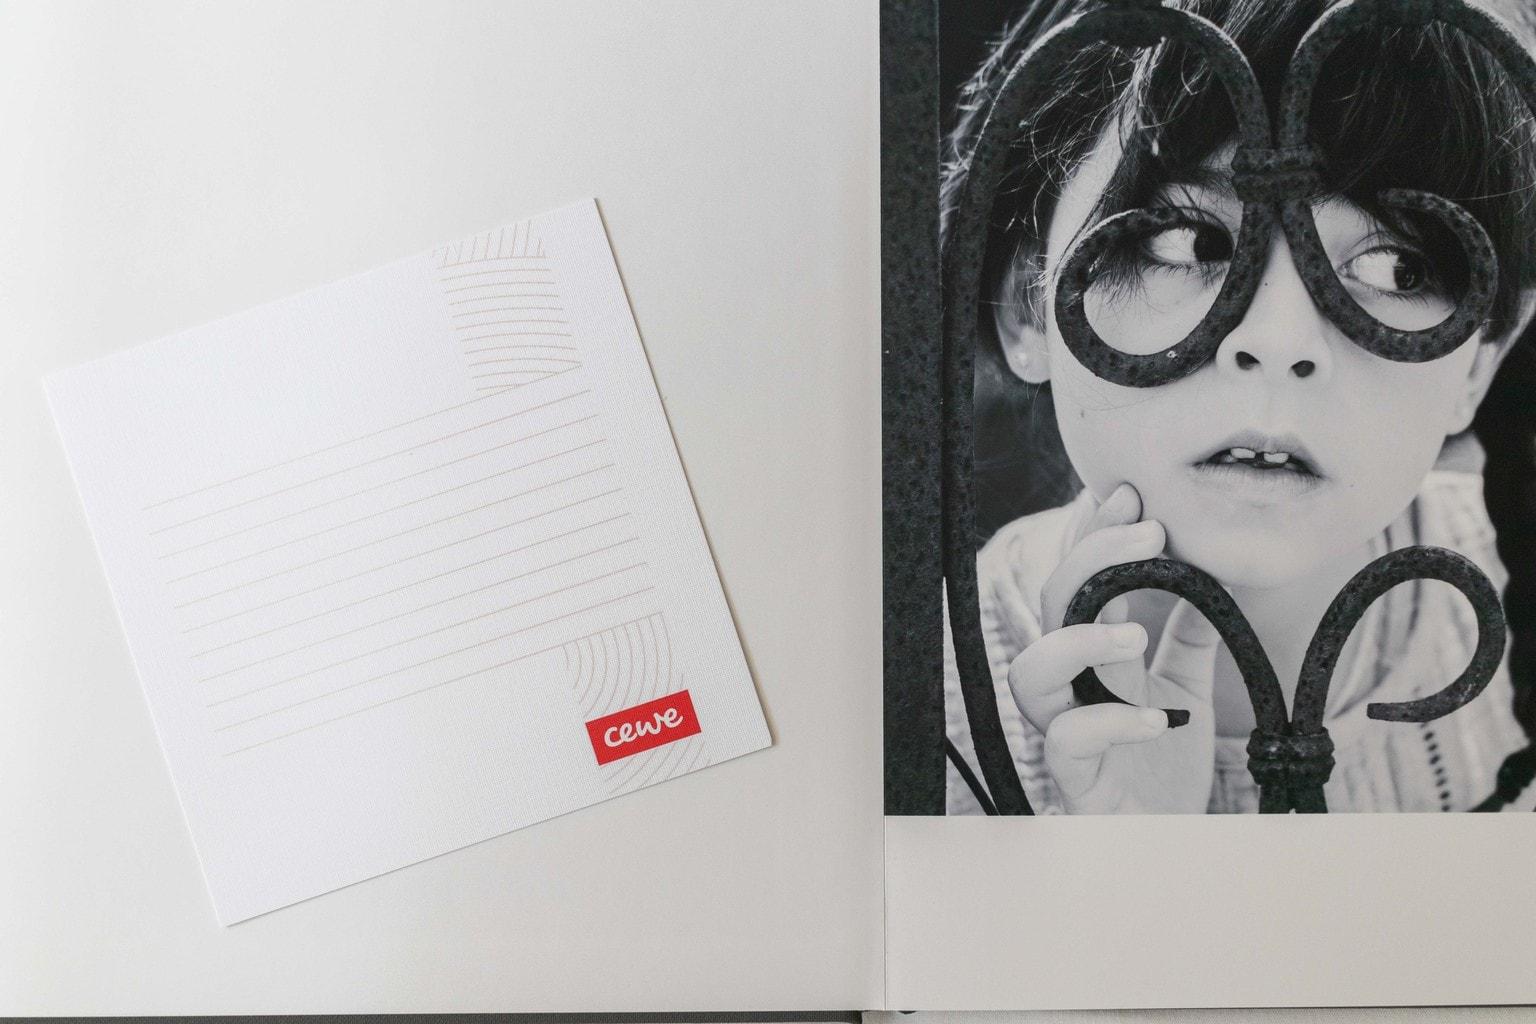 Tarjeta que acompaña álbum premium cewe